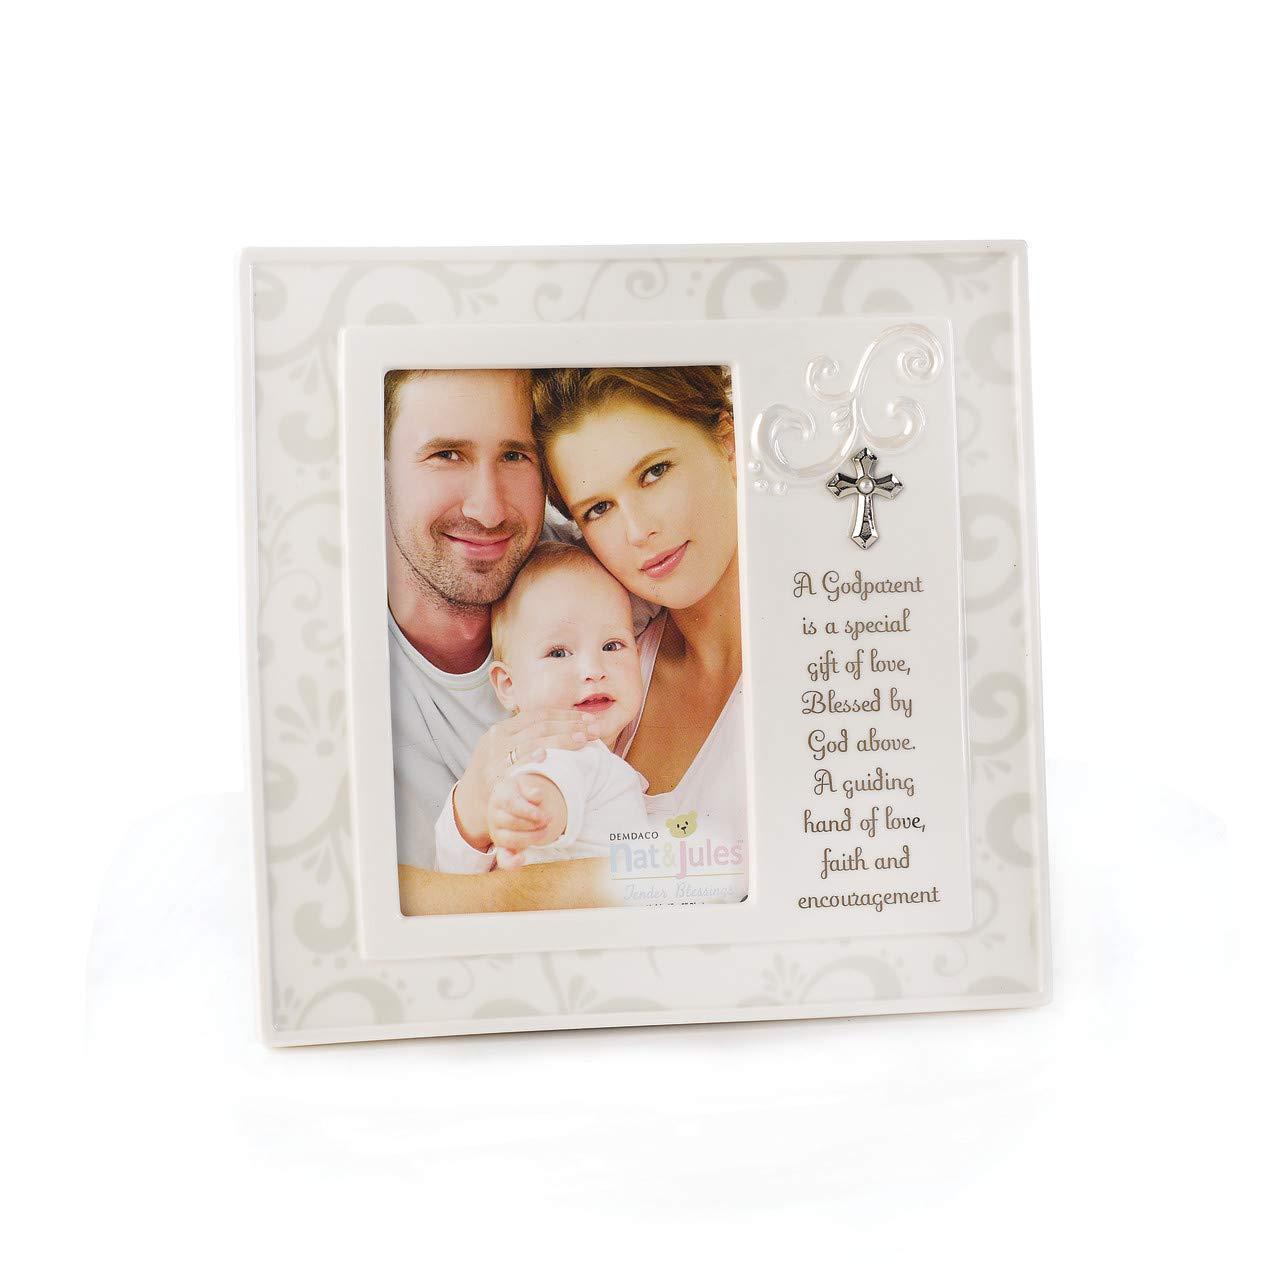 Godparent 8.5 x 8.5 Porcelain Picture Frame